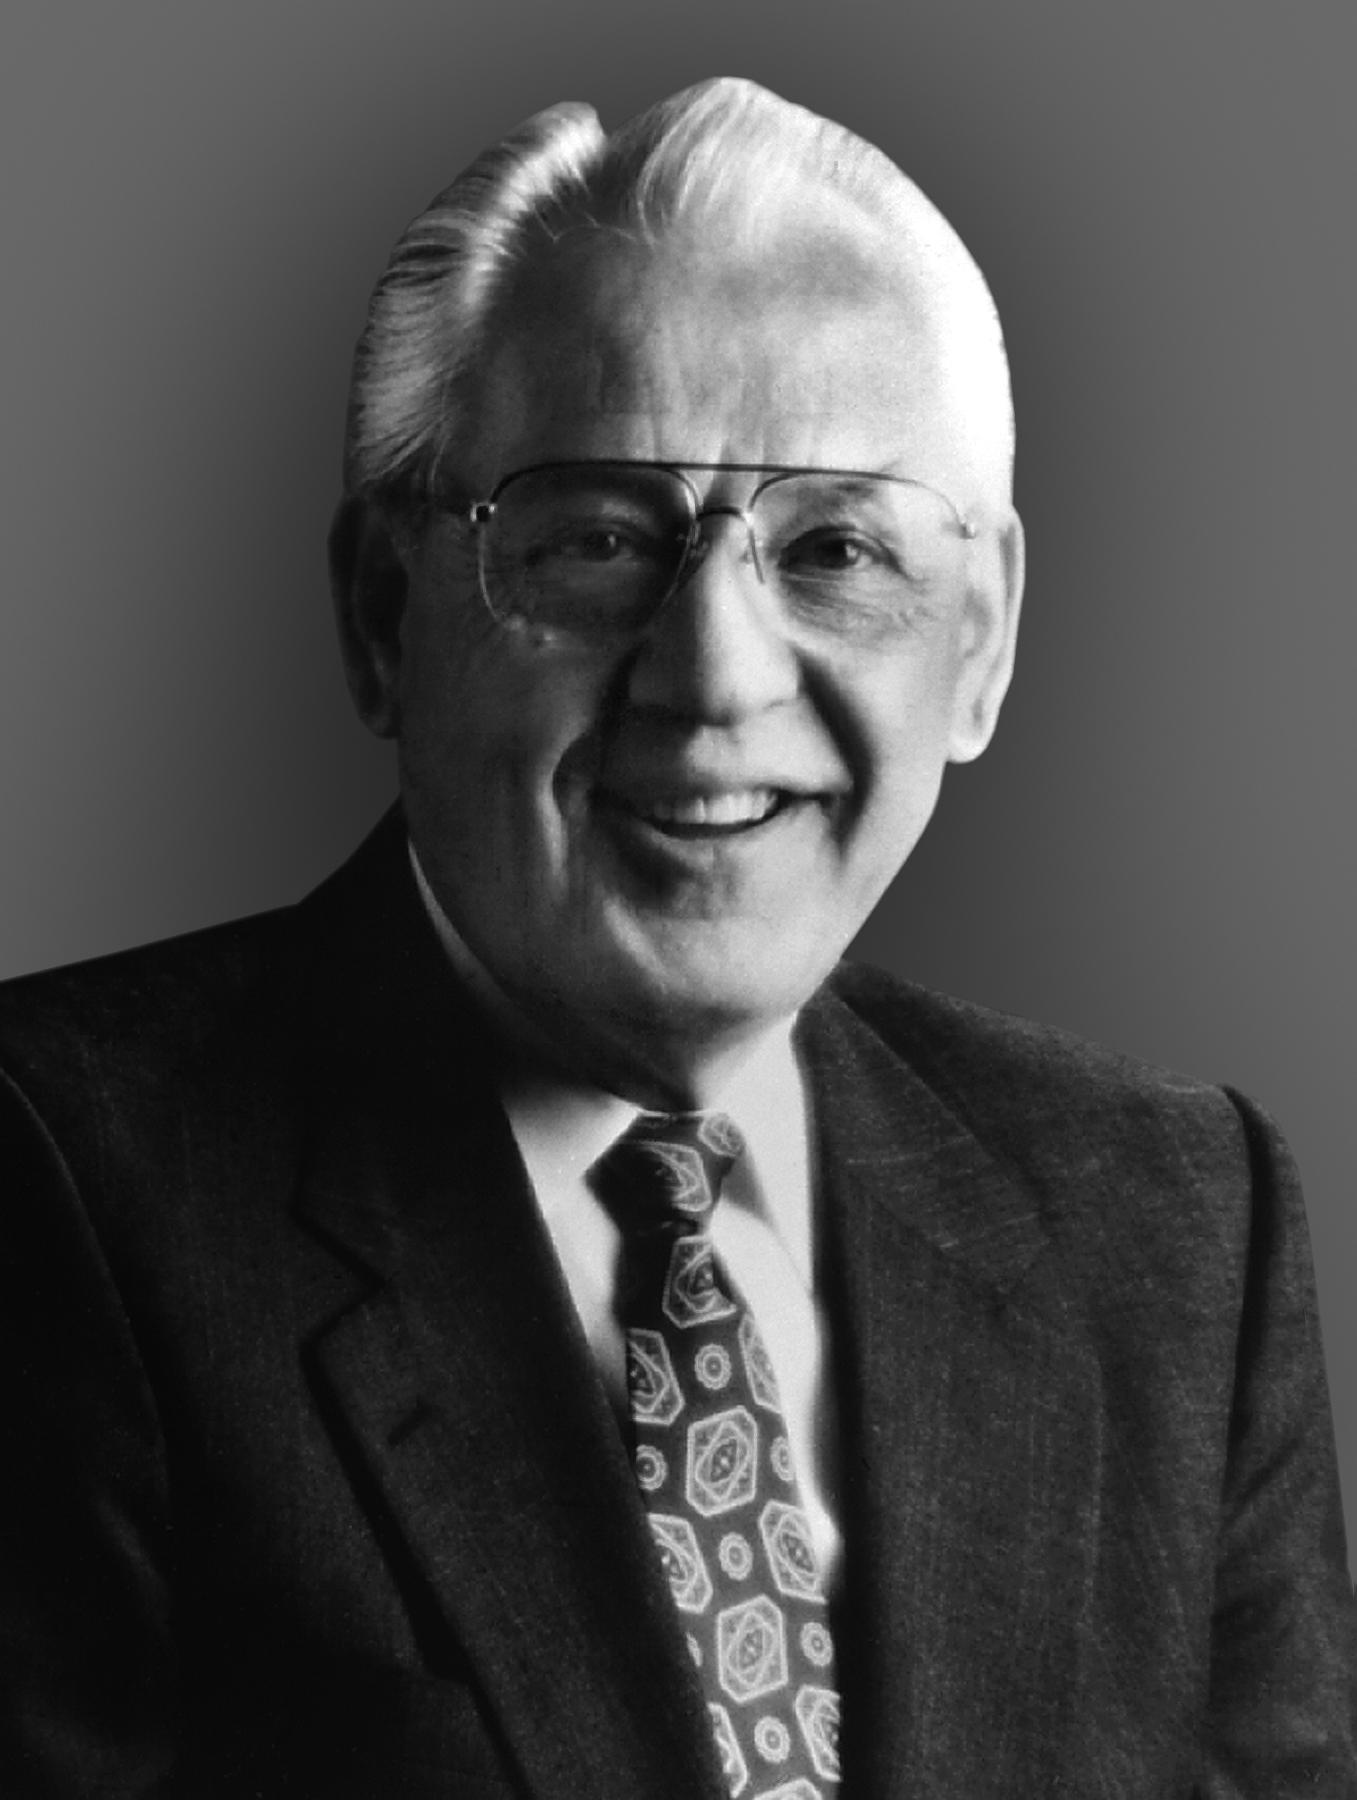 Patrick Henry Norton